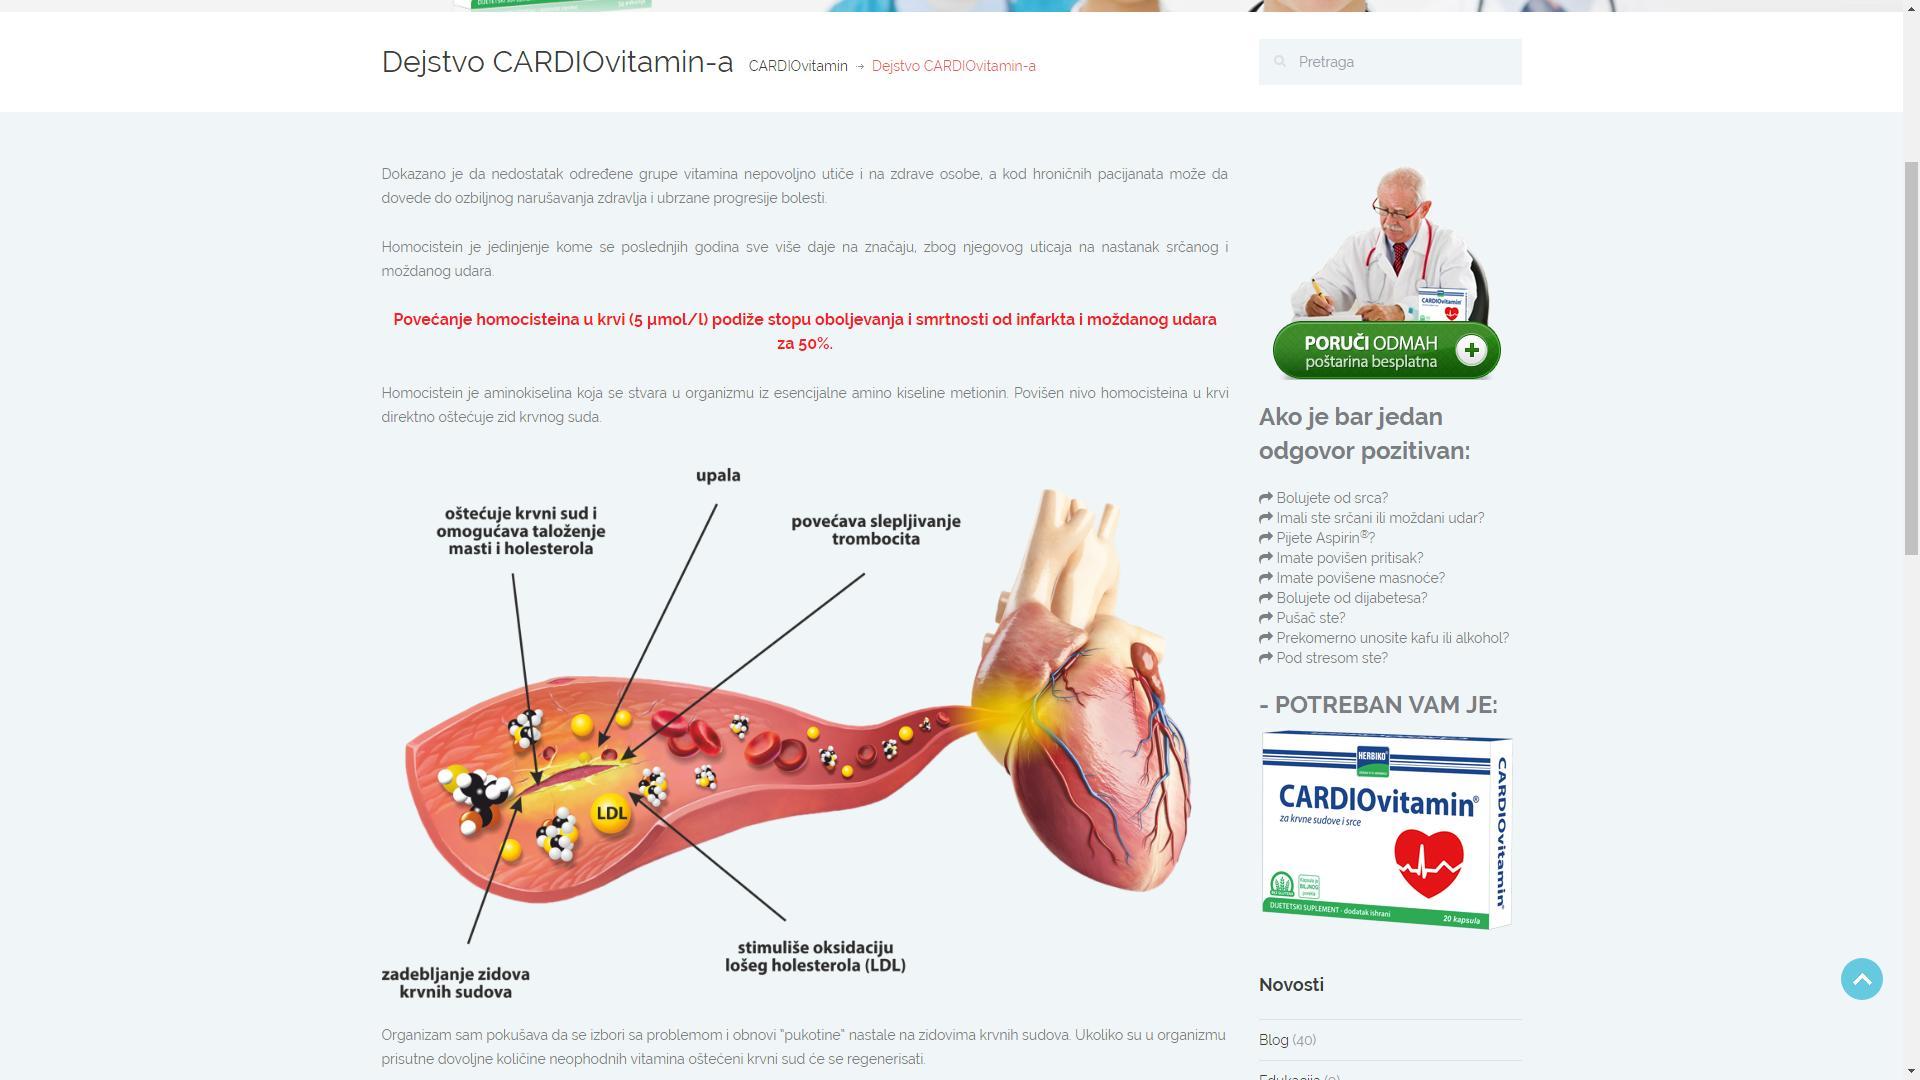 sKa portfolio sajtovi - Cardiovitamin 6